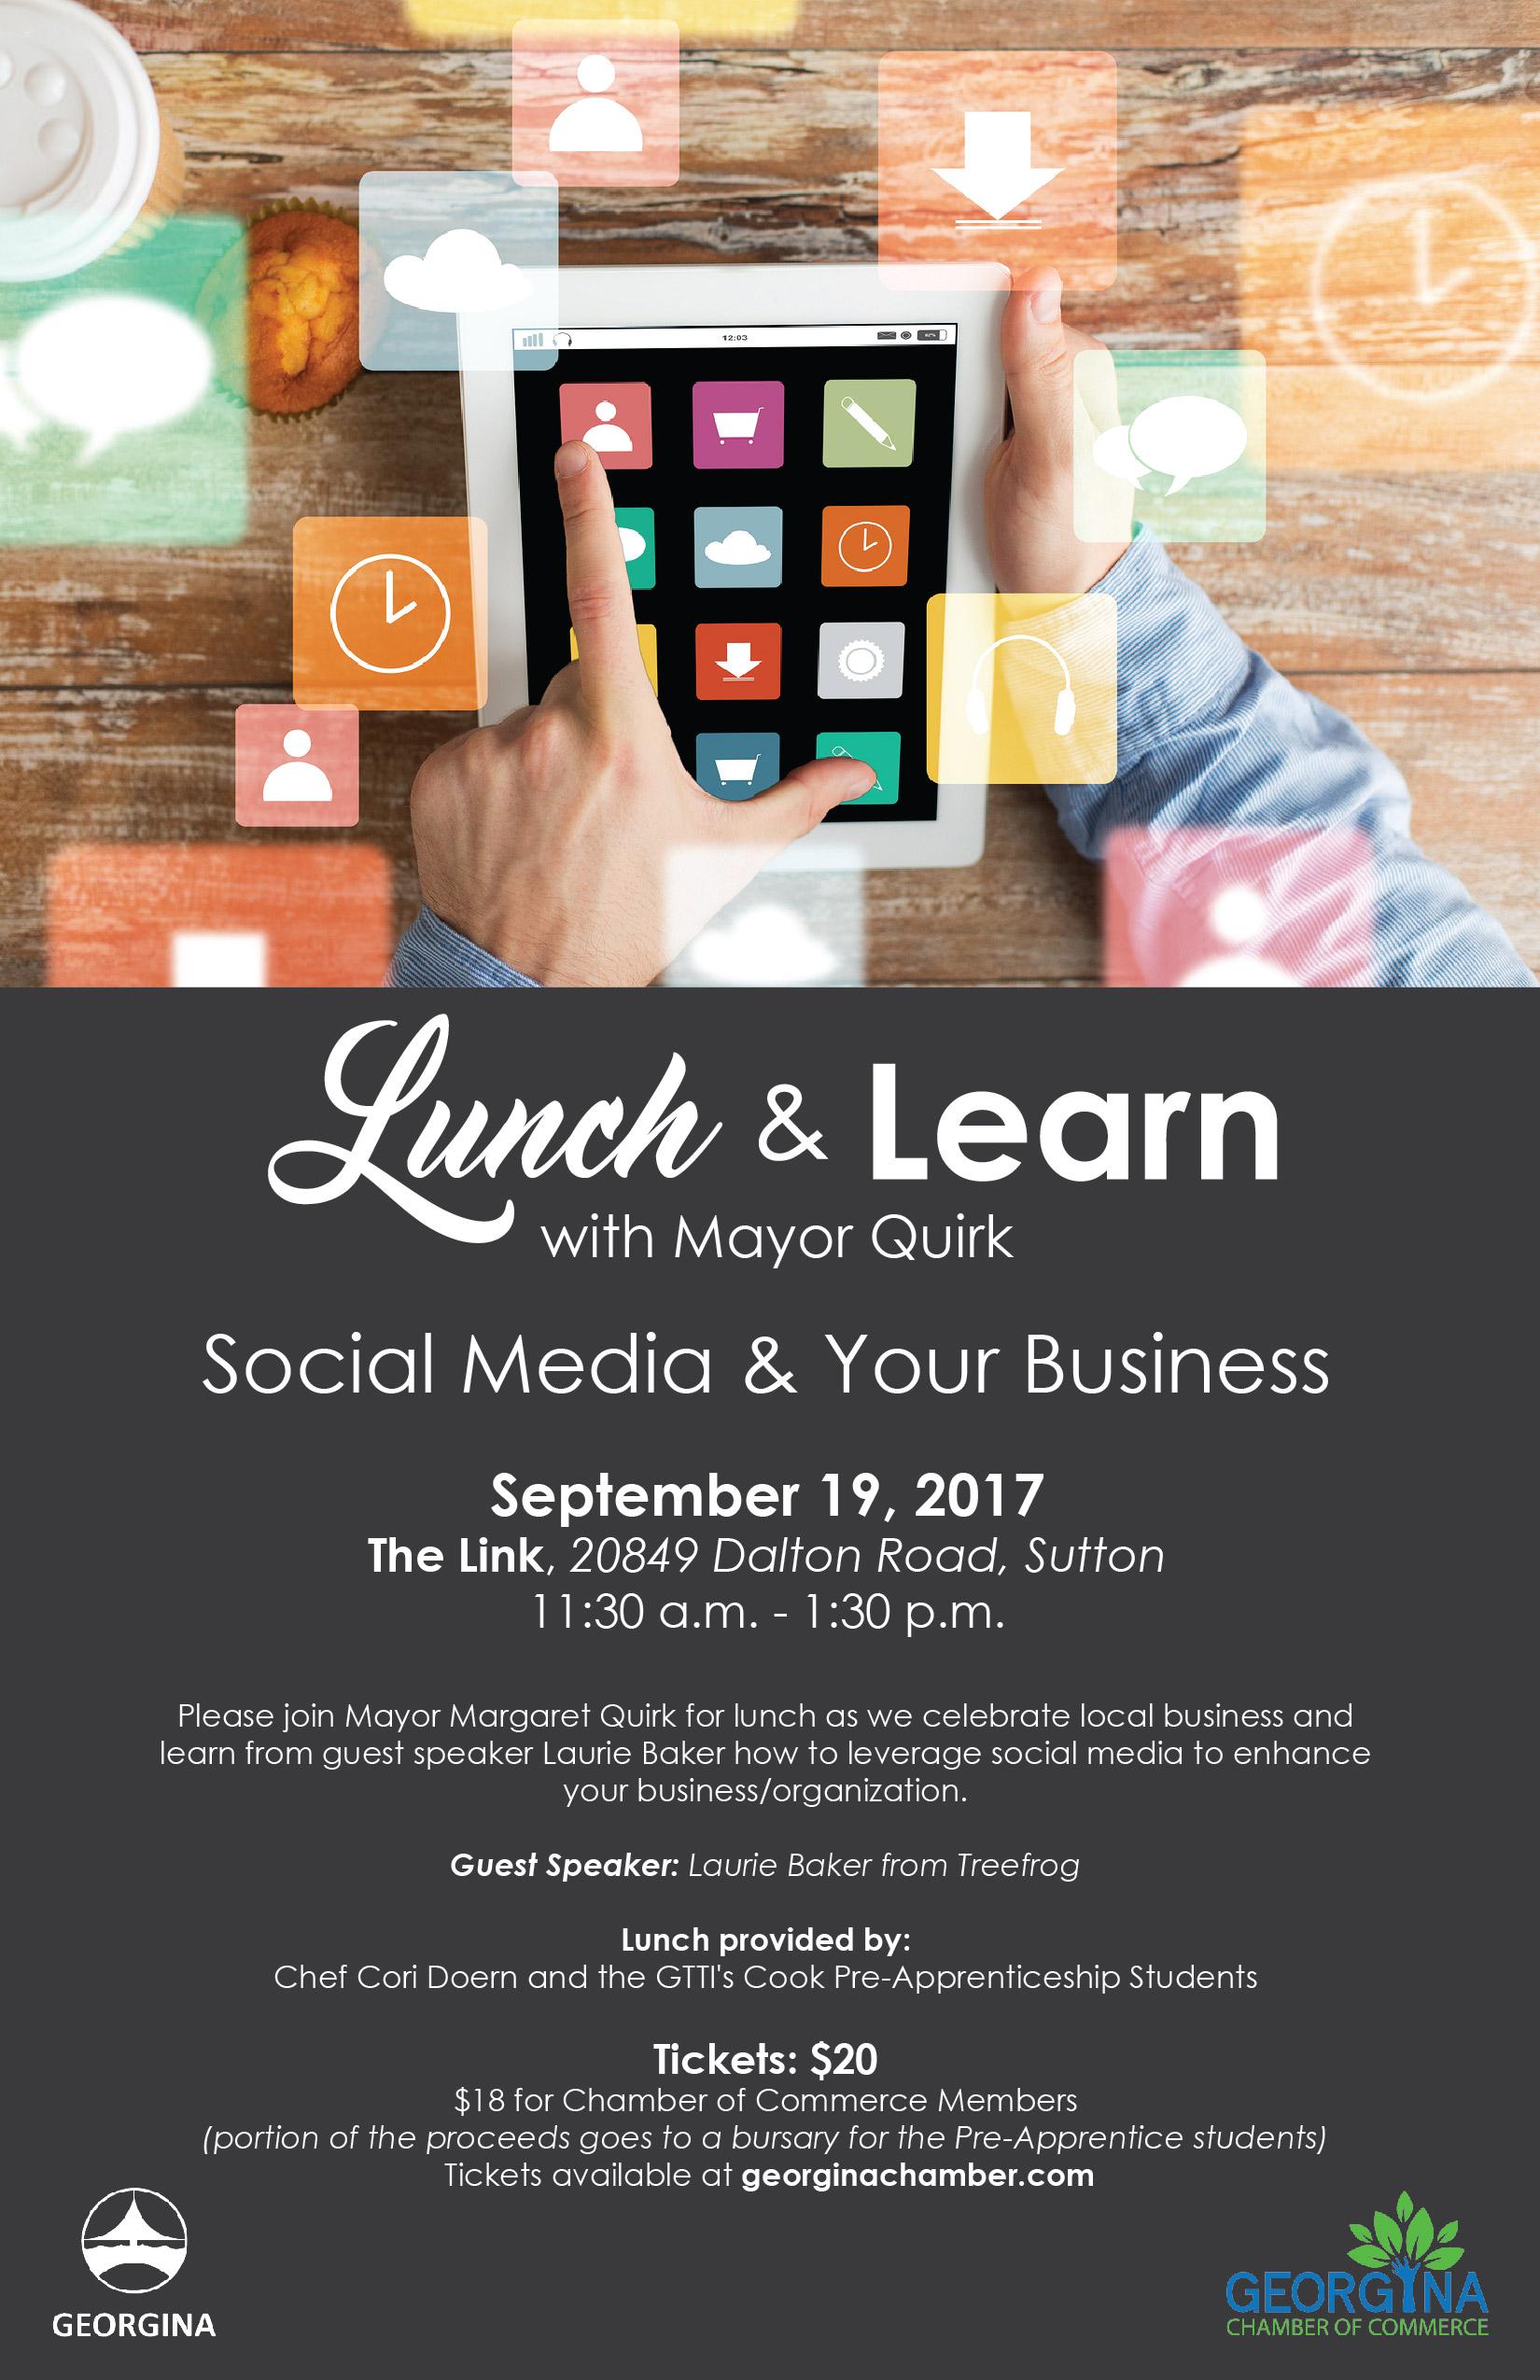 LunchLearn_SocialMedia-01.jpg